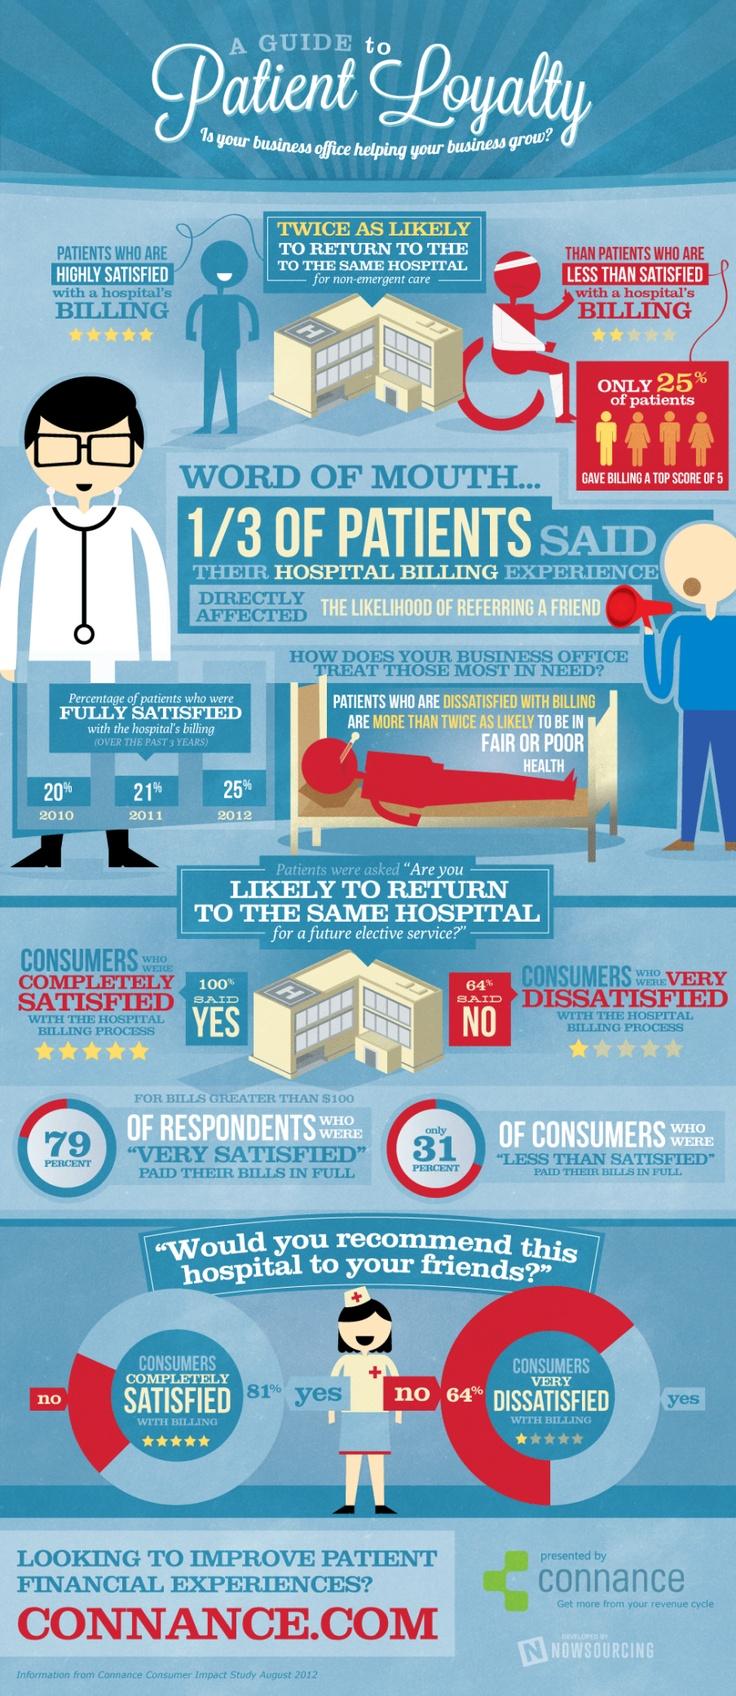 #Healthcare #patient #care